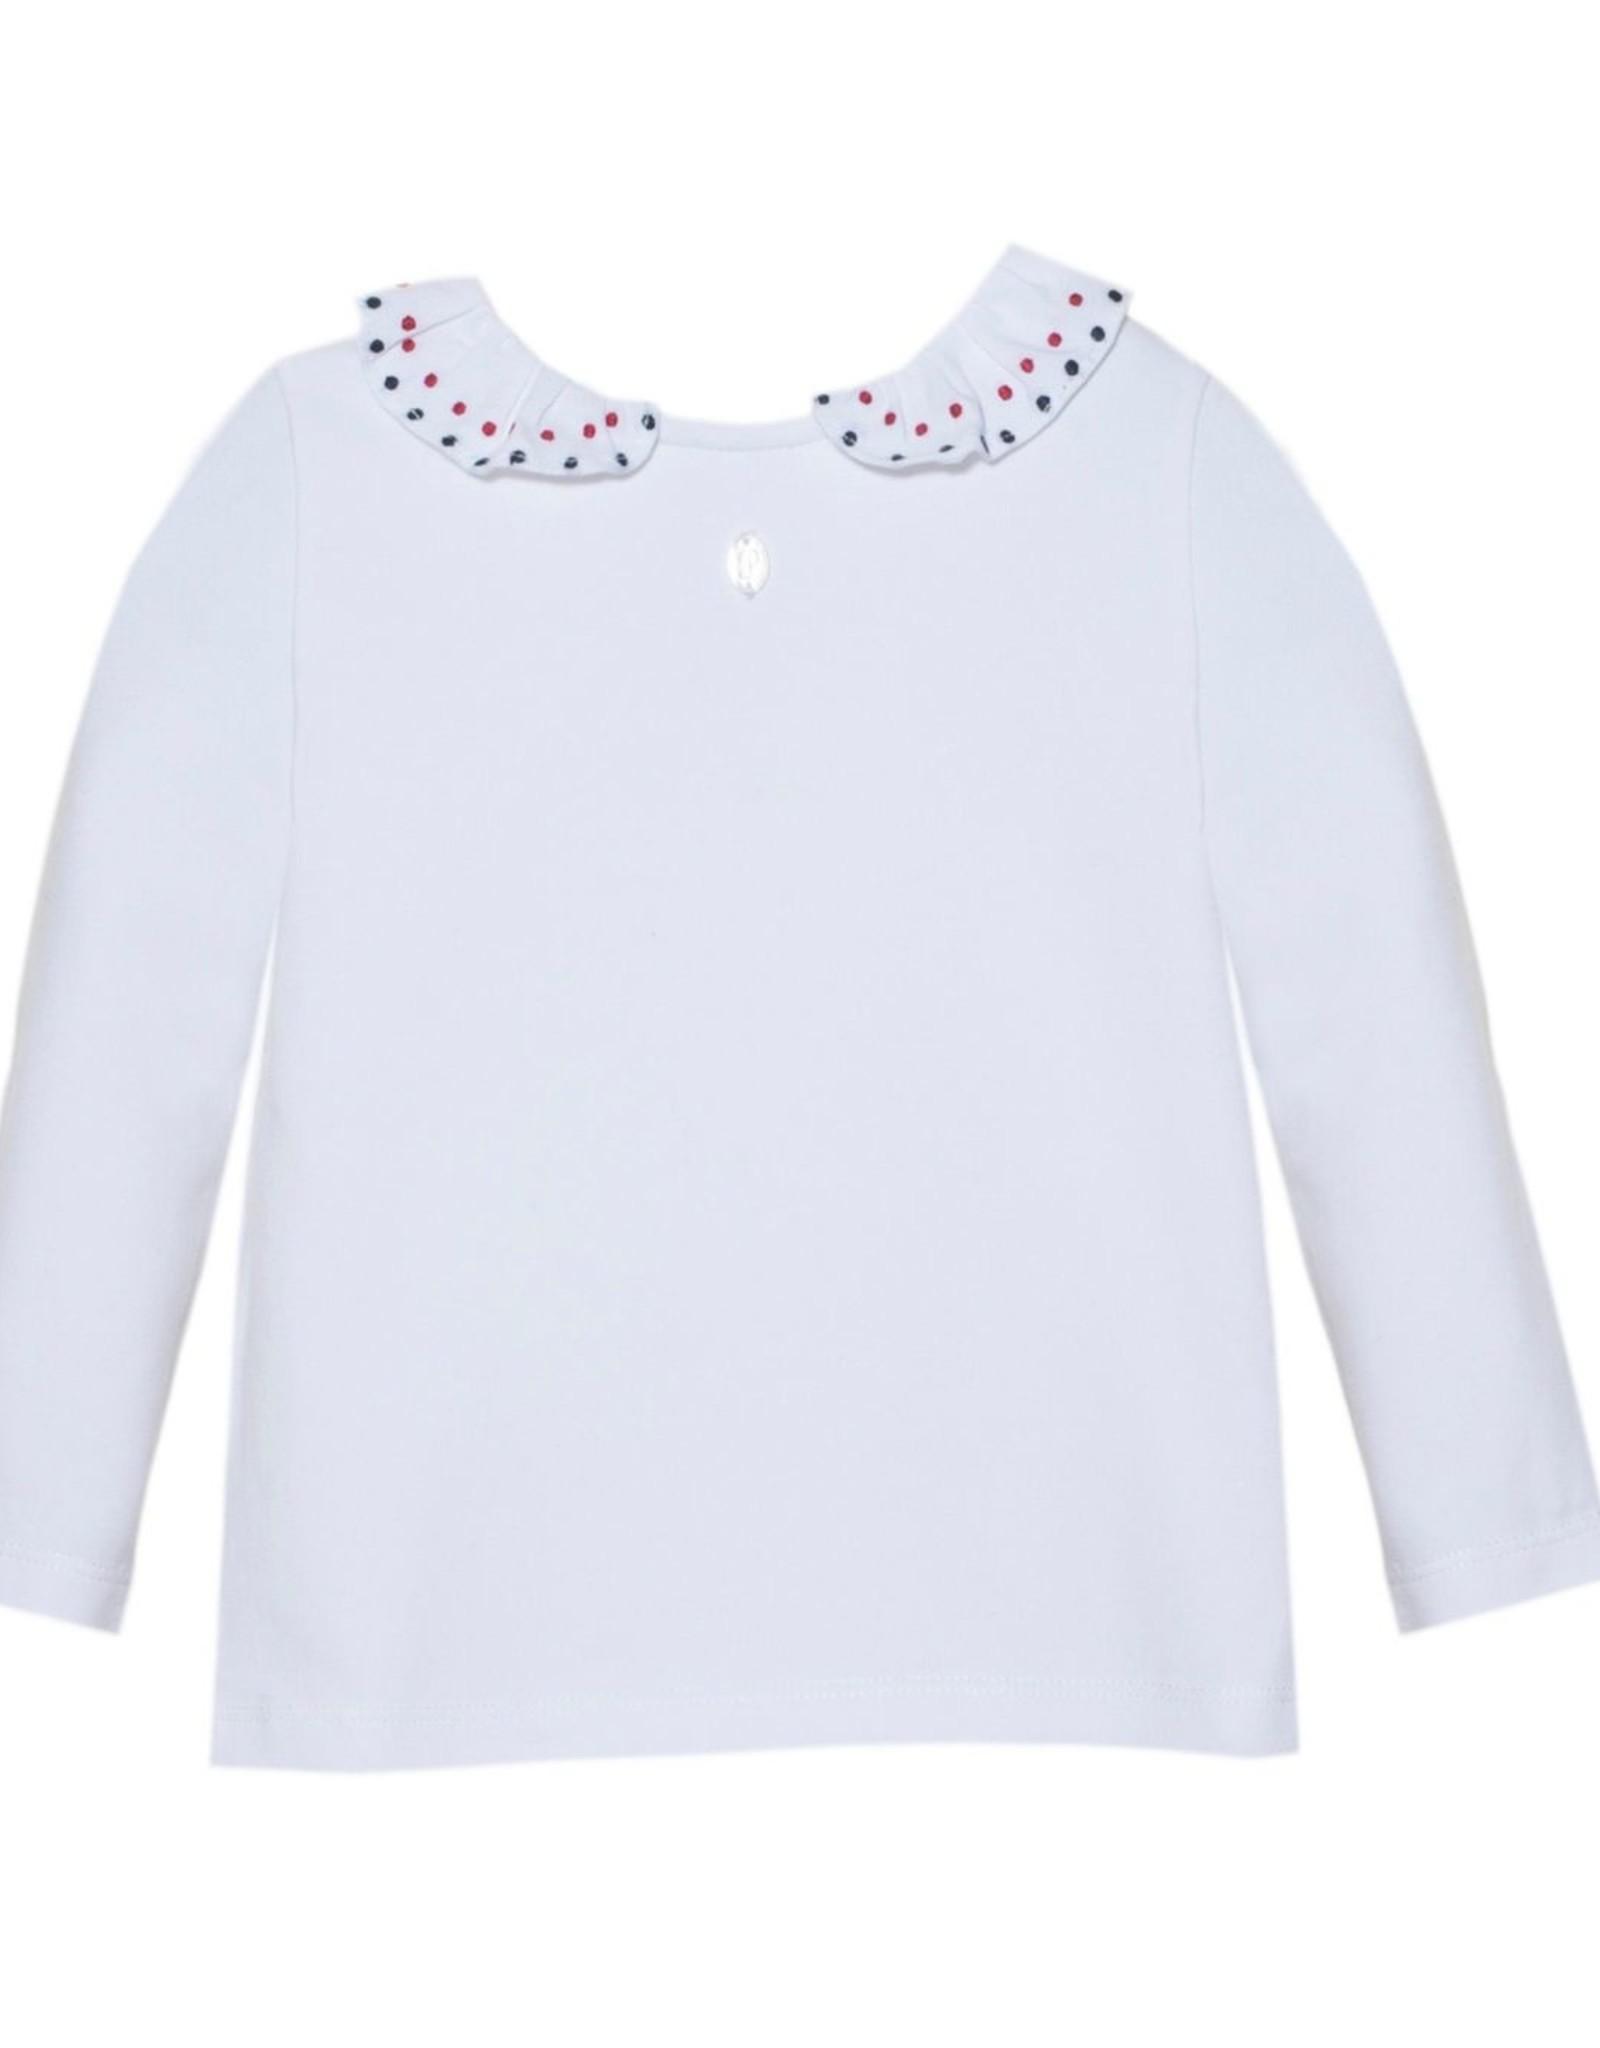 PATACHOU Girl t-shirt white